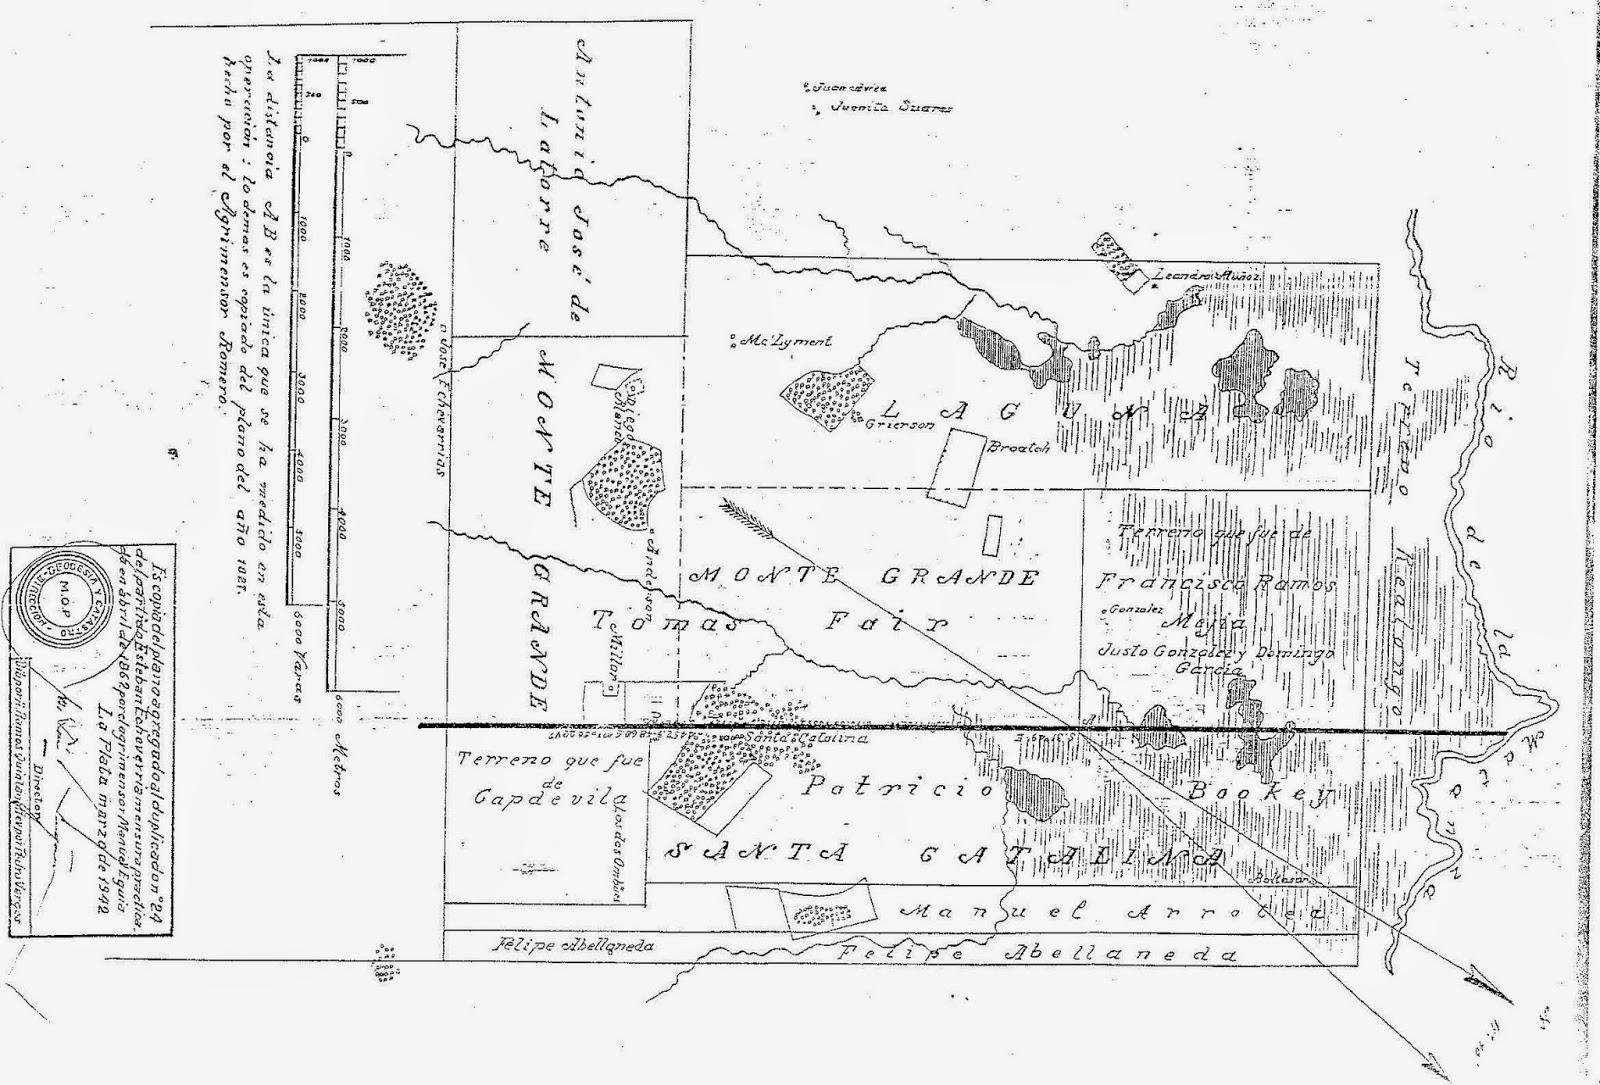 Mapa de la Época Colonial